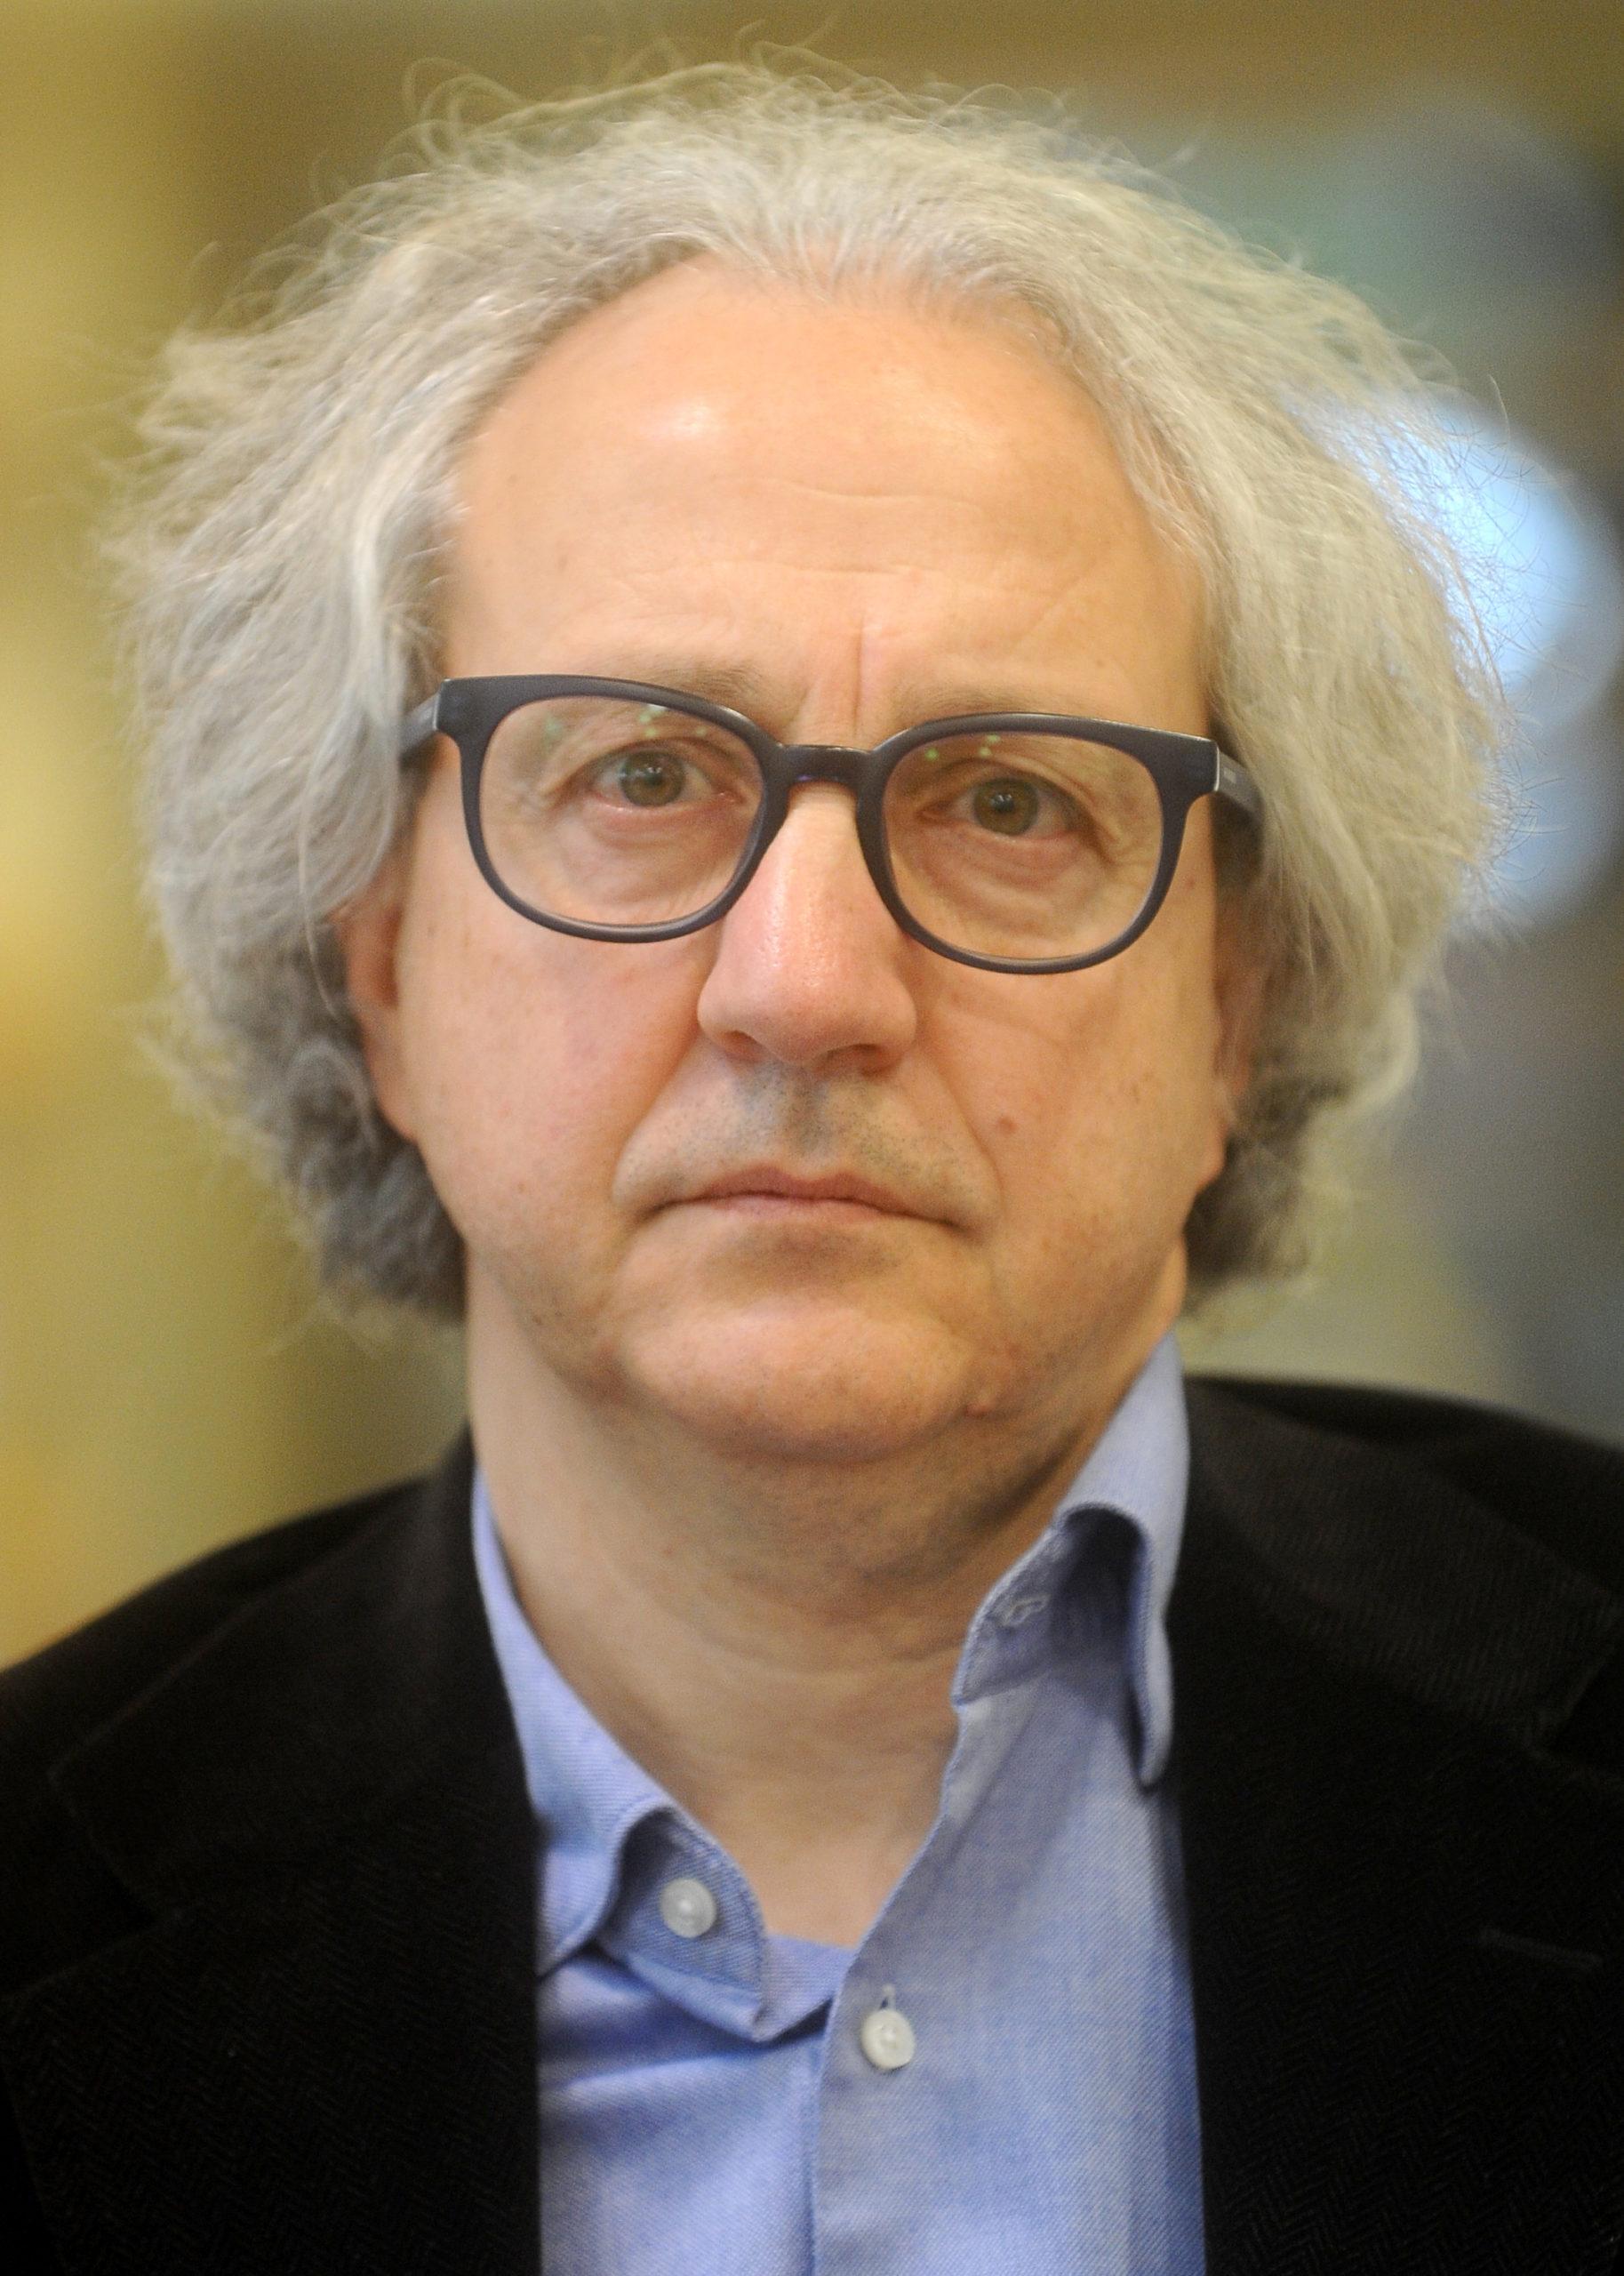 Stefano Allievi Lectorinfabula